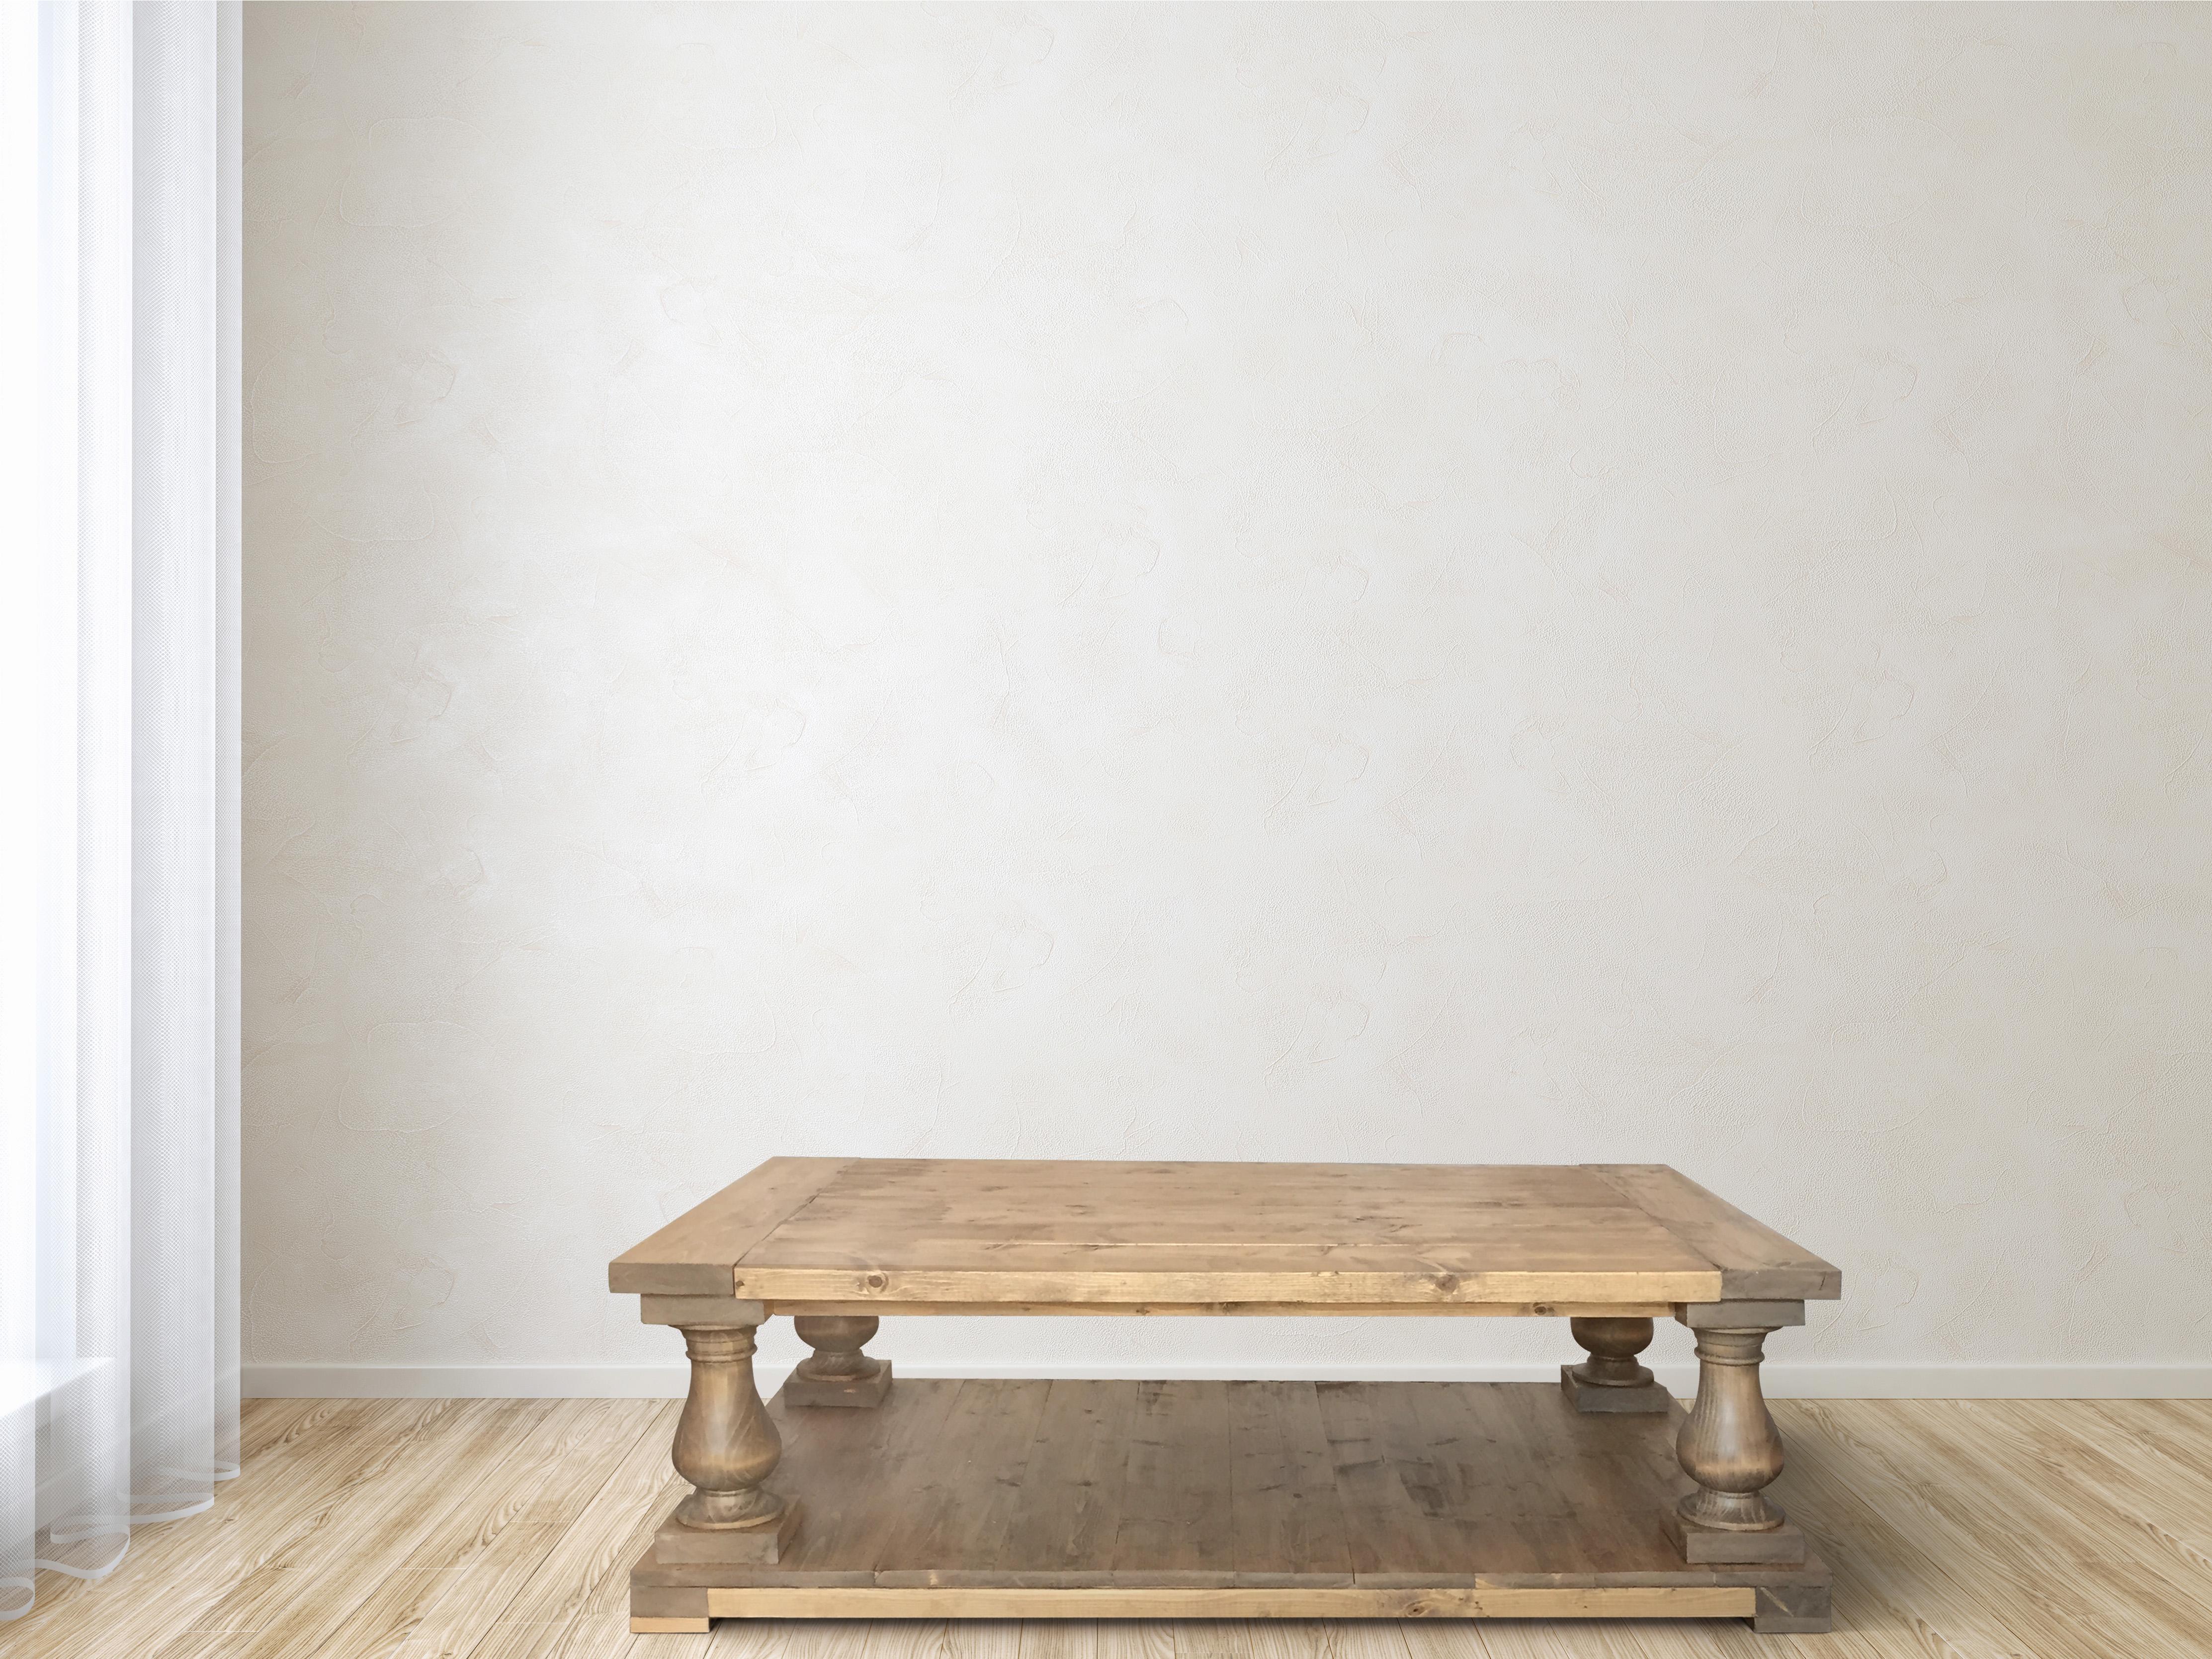 Balustrade Coffee Table Ana White